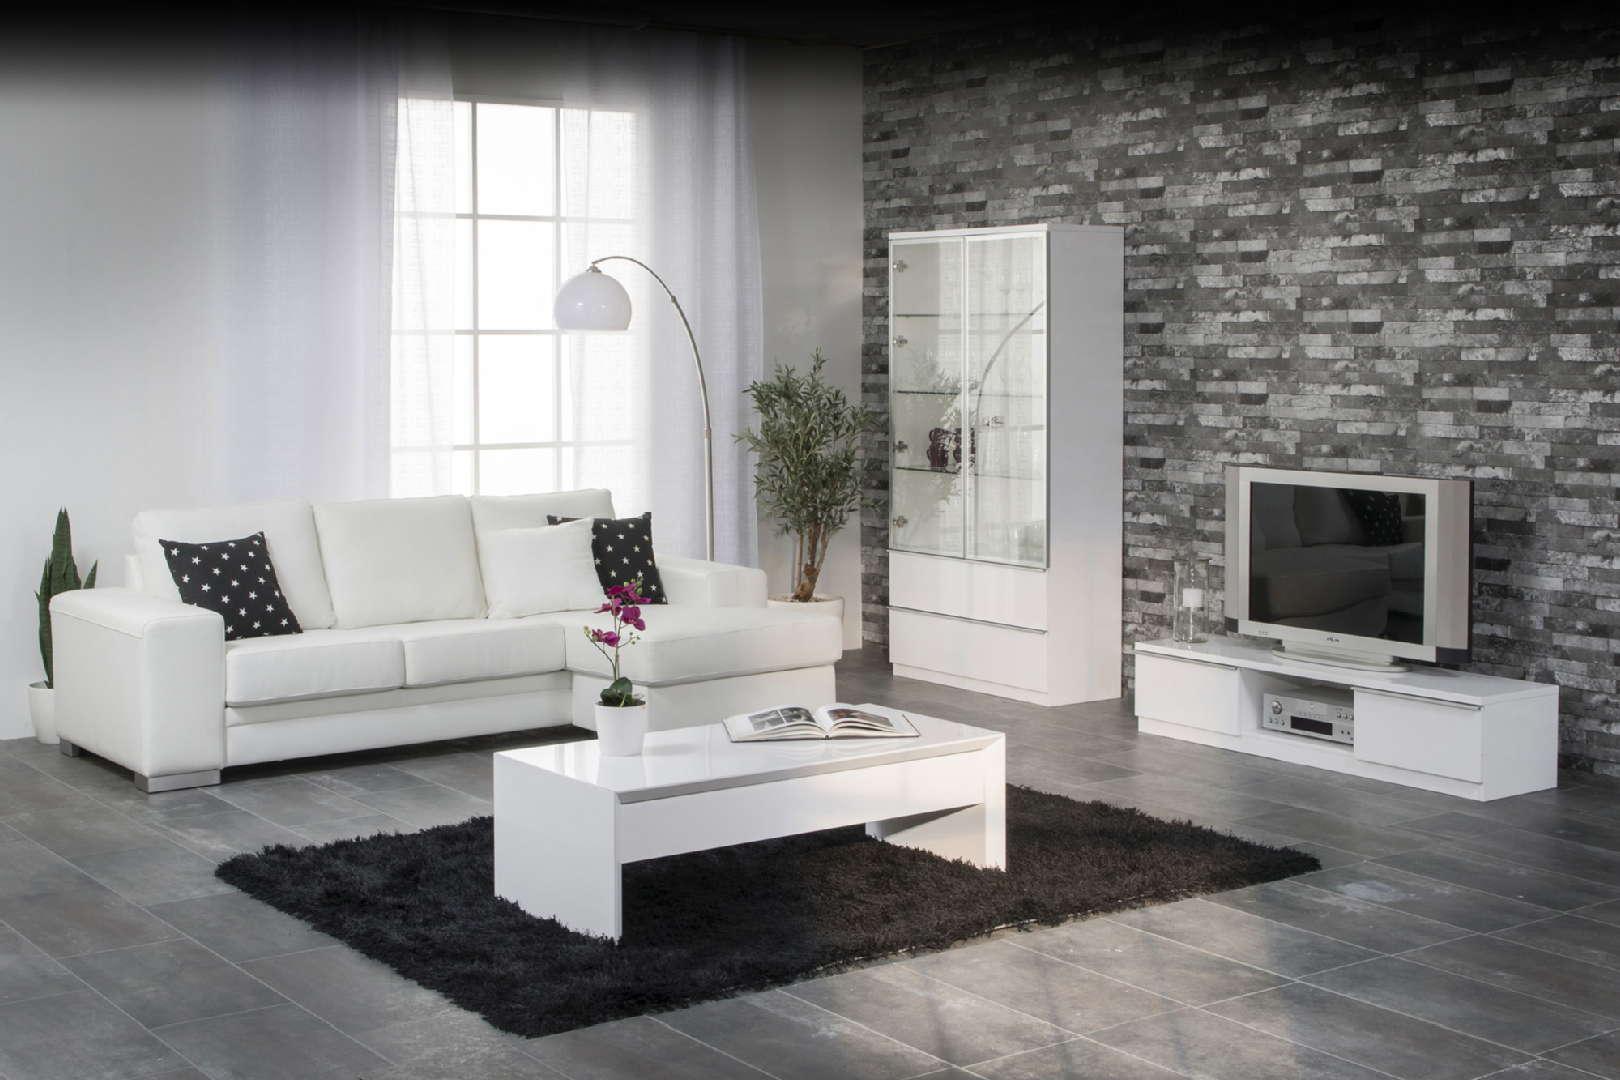 Moderni olohuone, sisustus  olohuone, Ideapark